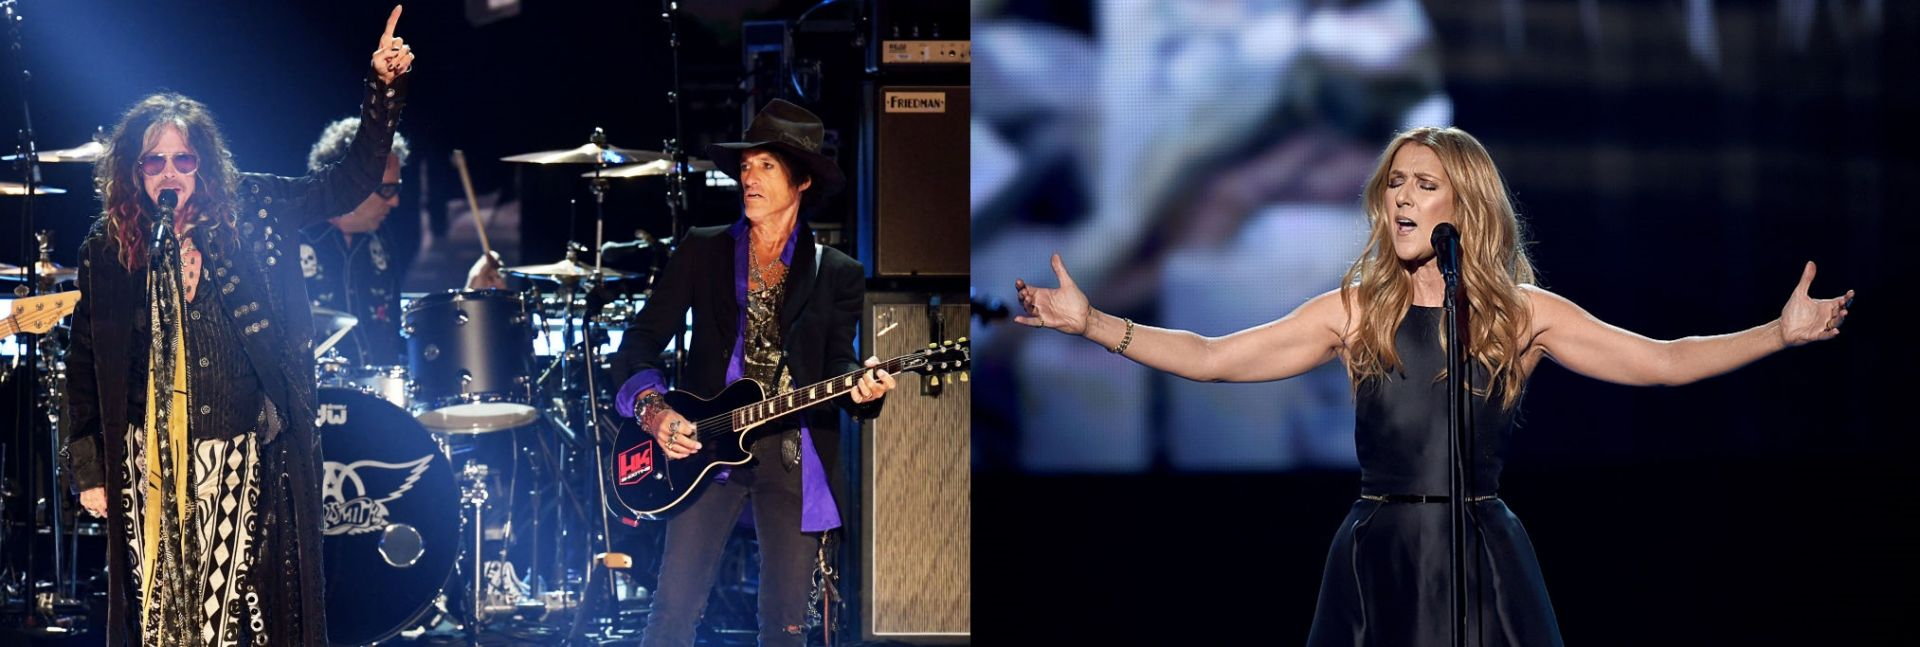 Aerosmith - Селин Дион